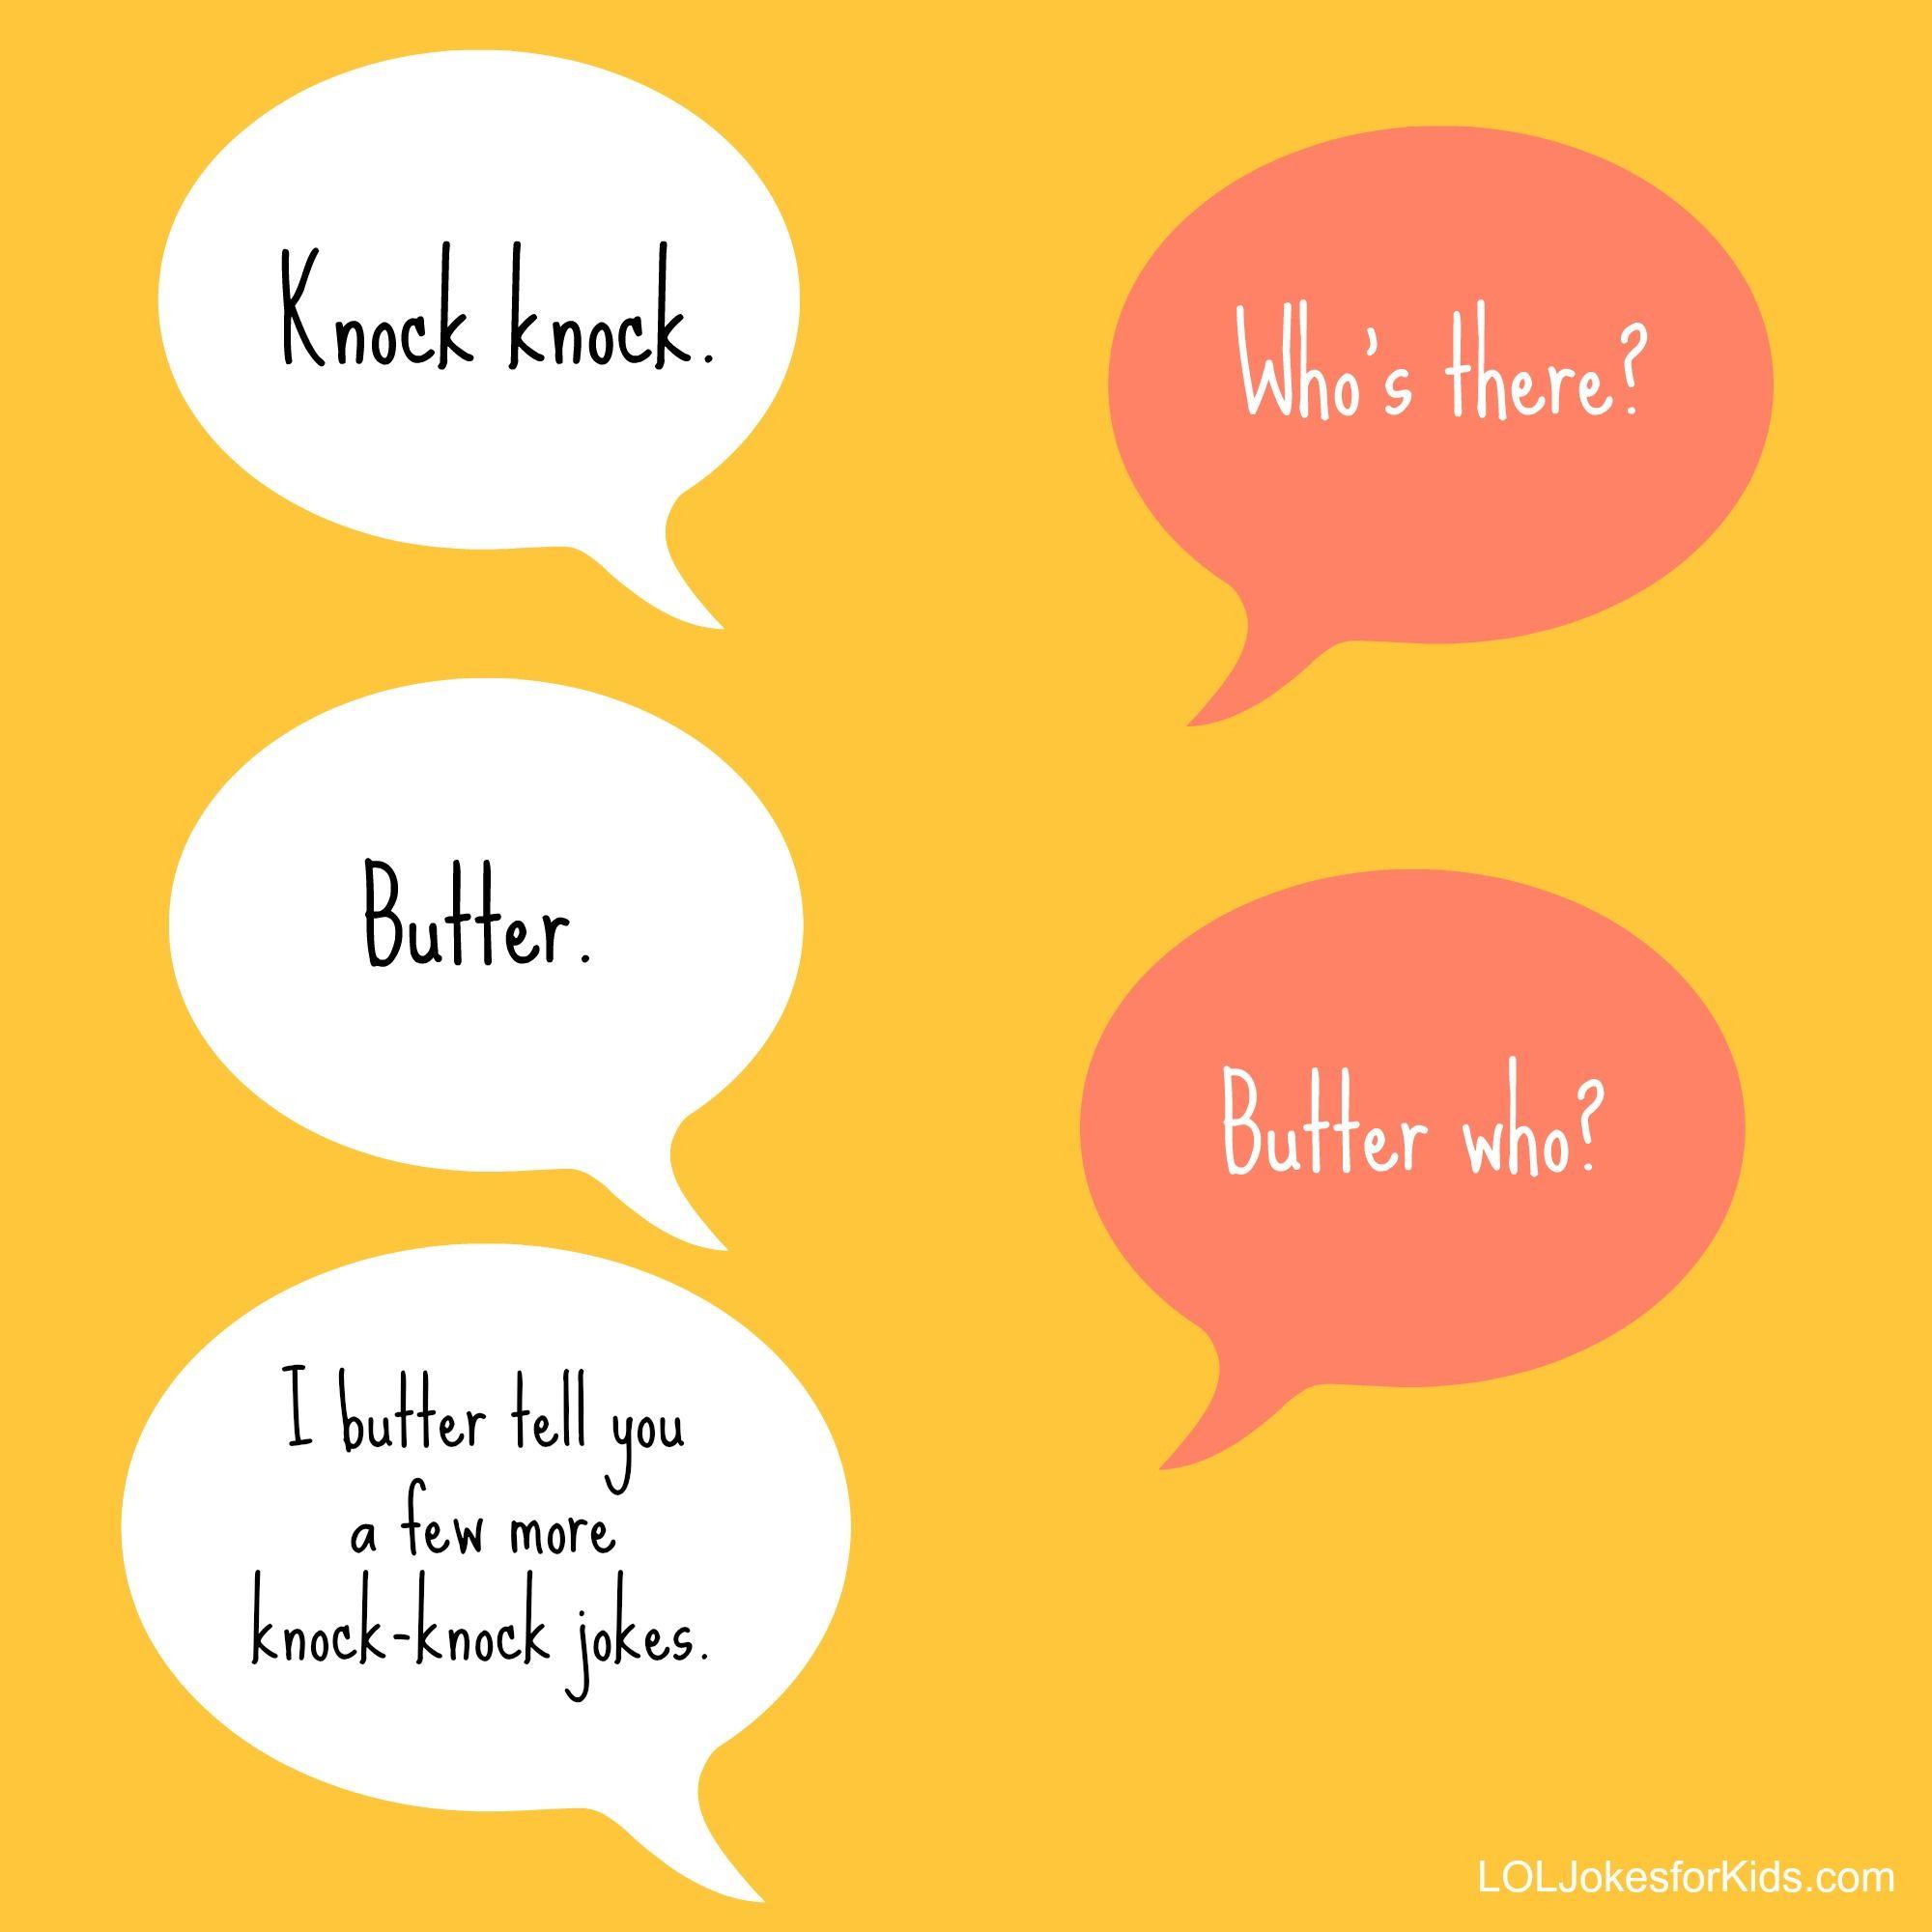 Knock Knock Jokes For Kids By Rob Elliott Funny Jokes For Kids Jokes For Kids Jokes For Teens